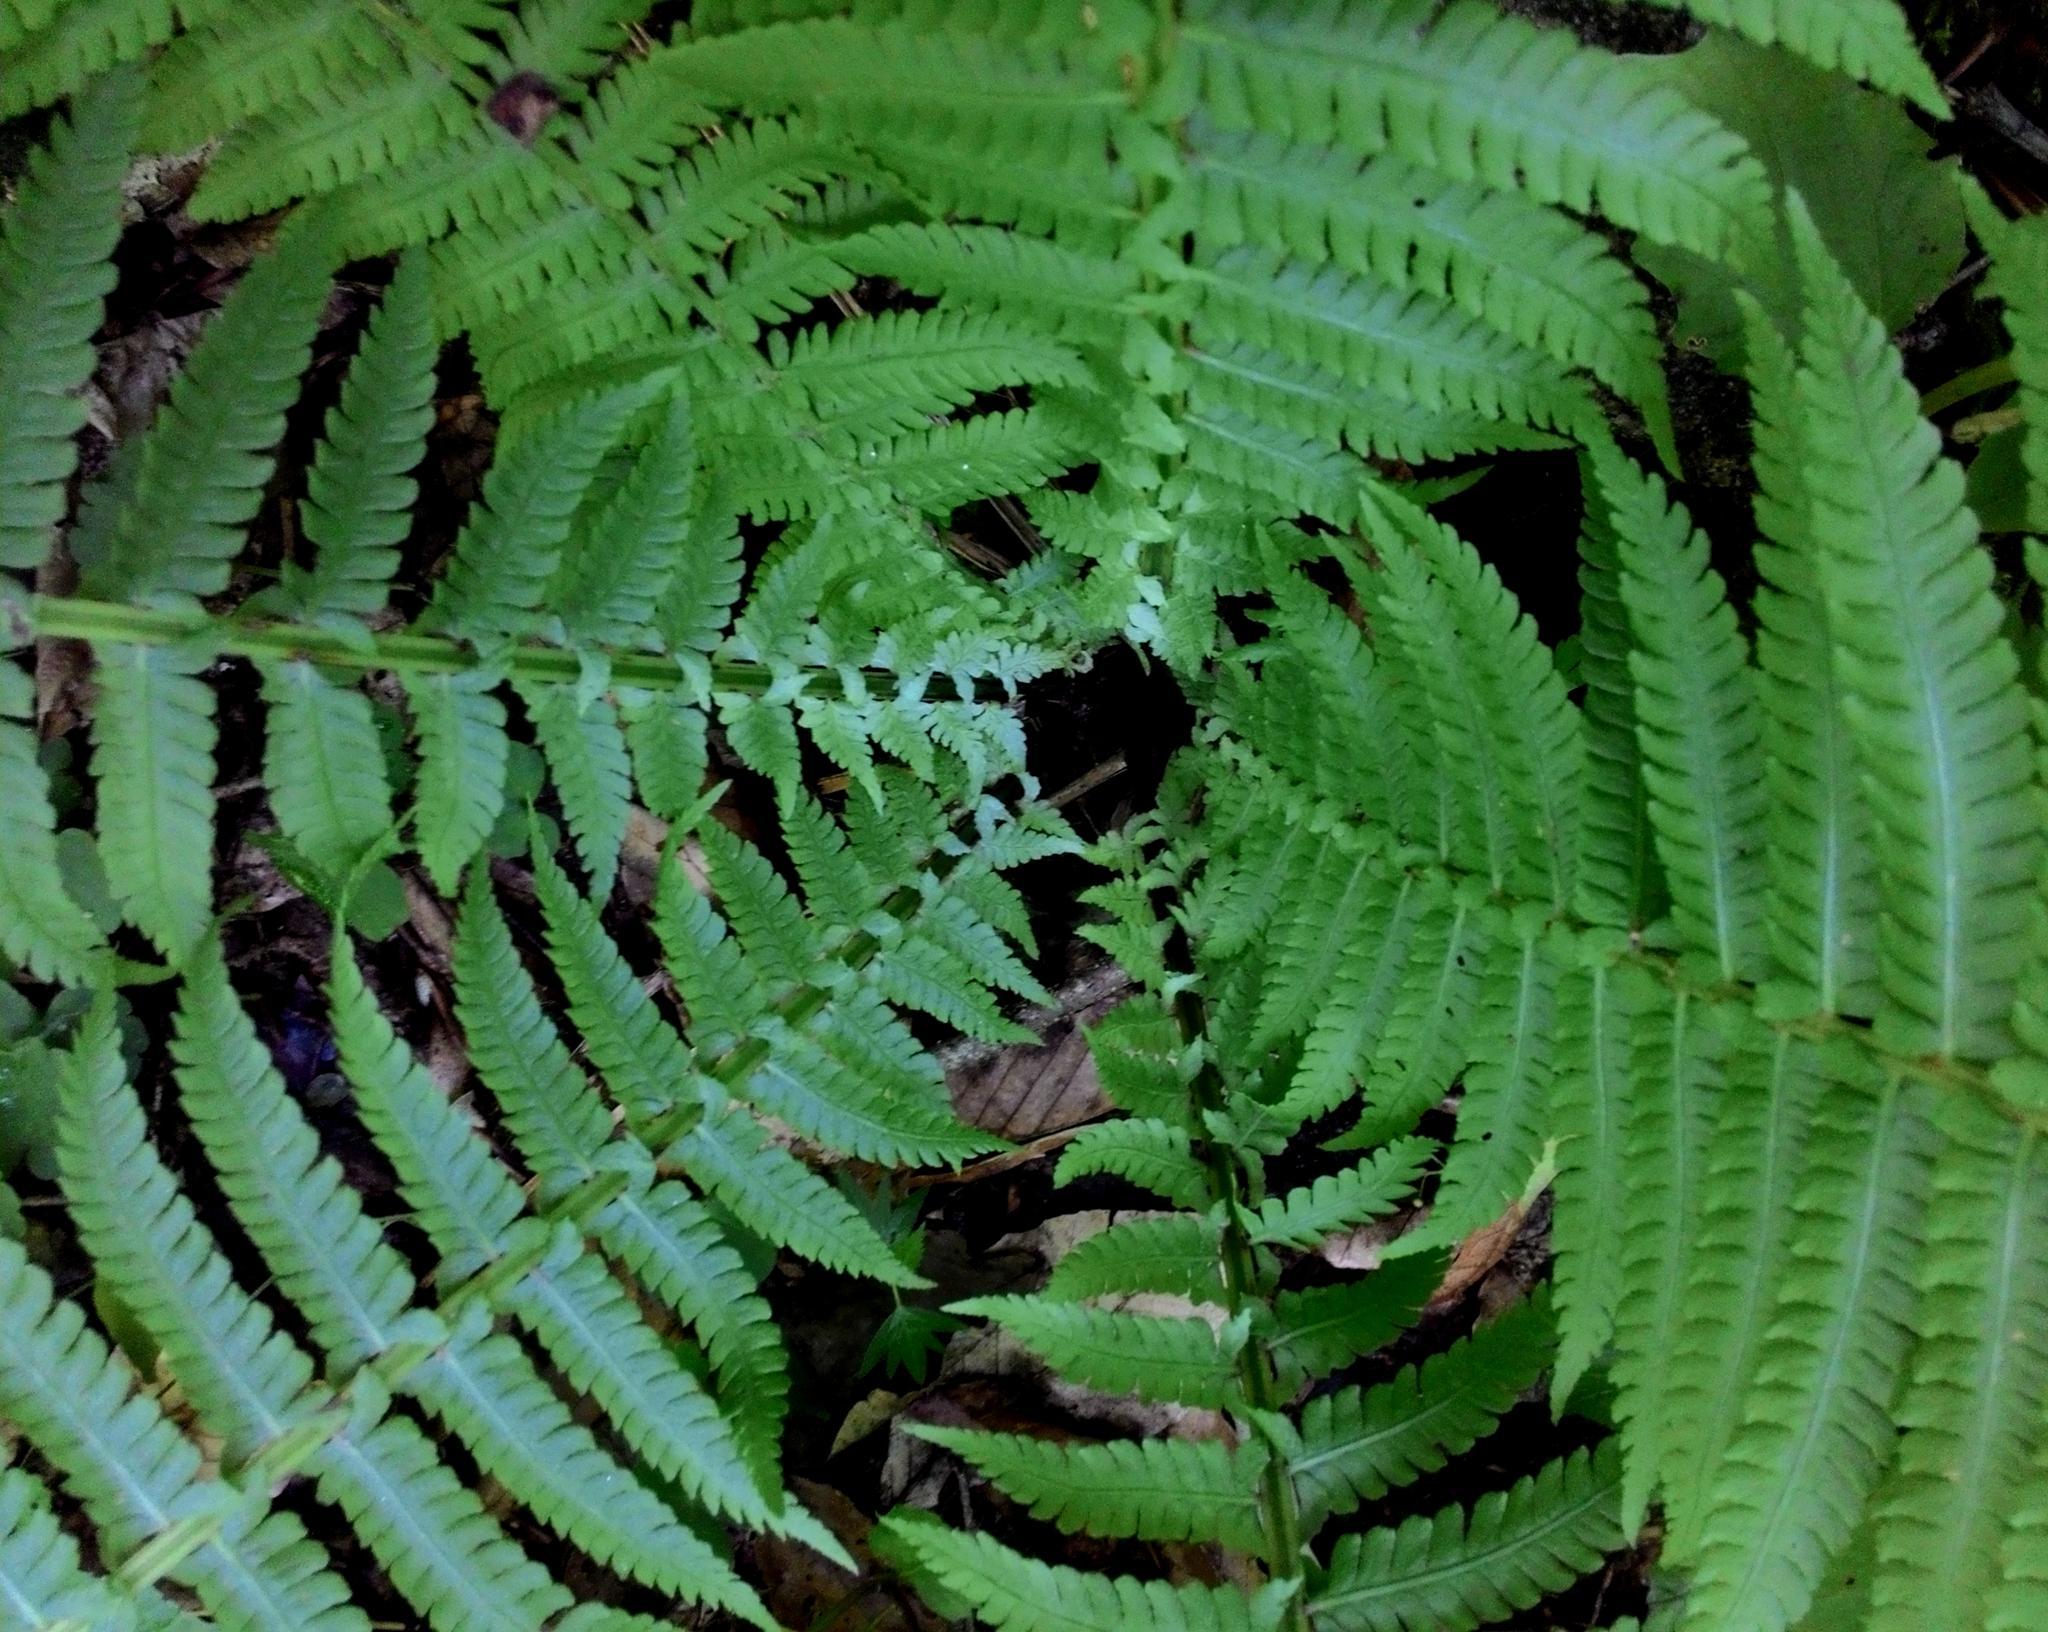 Fern leaves by manuta